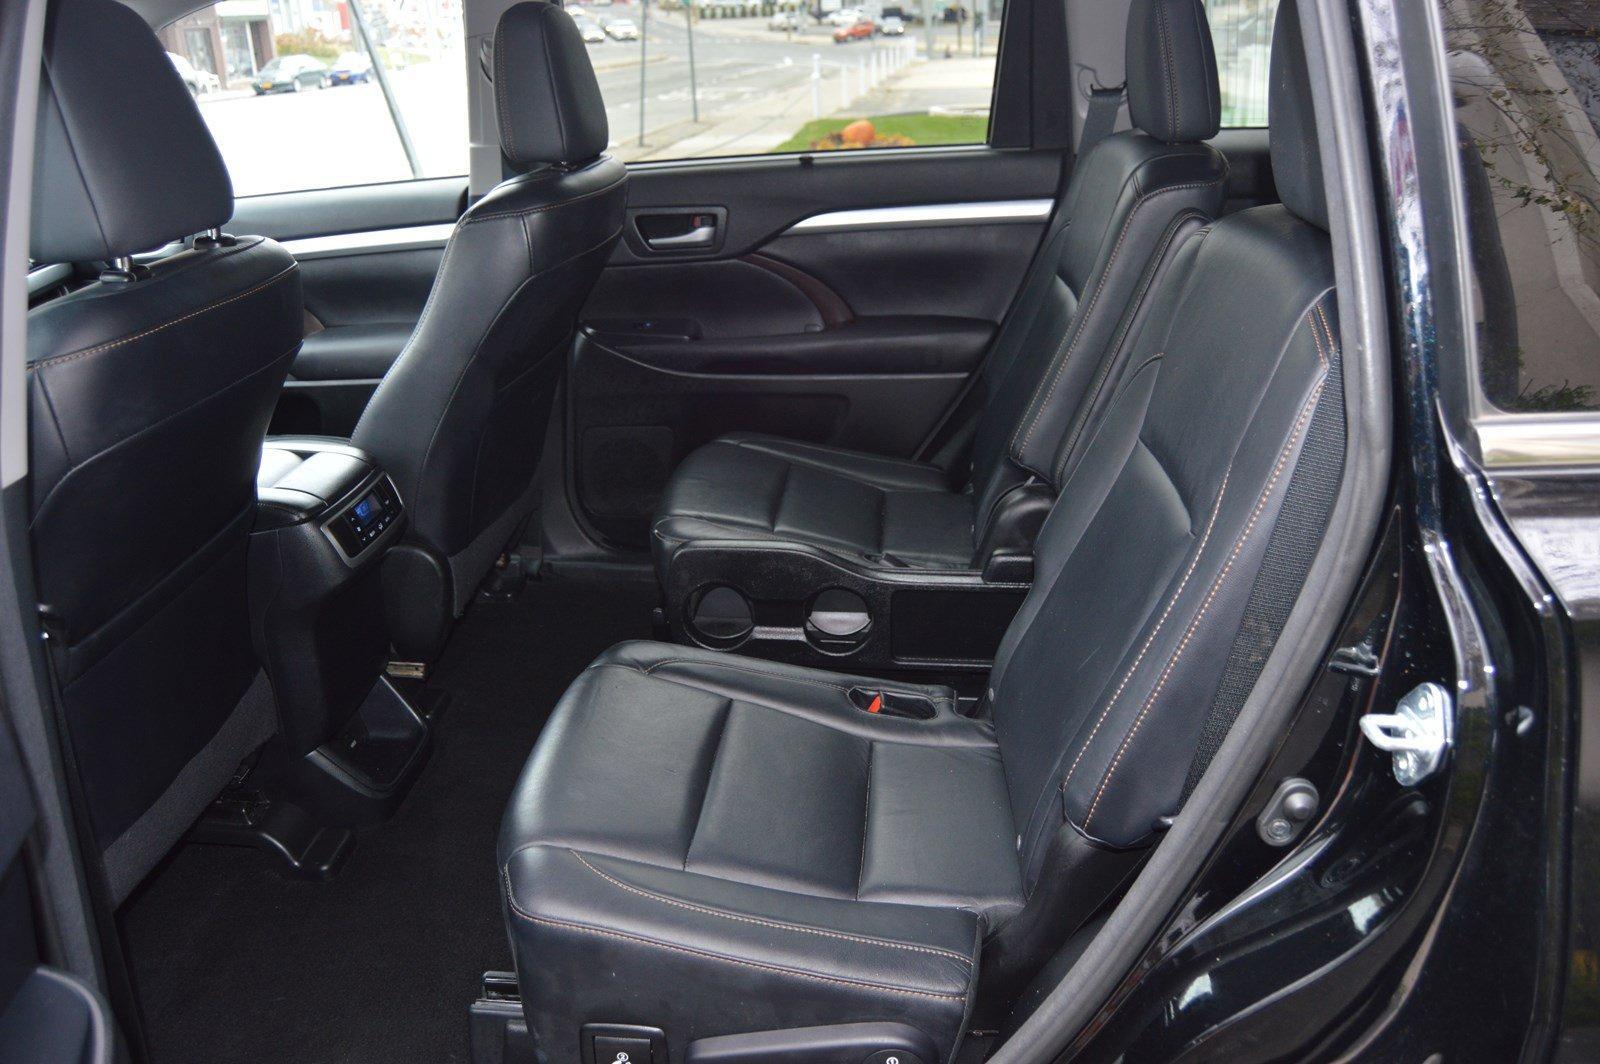 Used-2015-Toyota-Highlander-XLE-(Navi/-Leather)